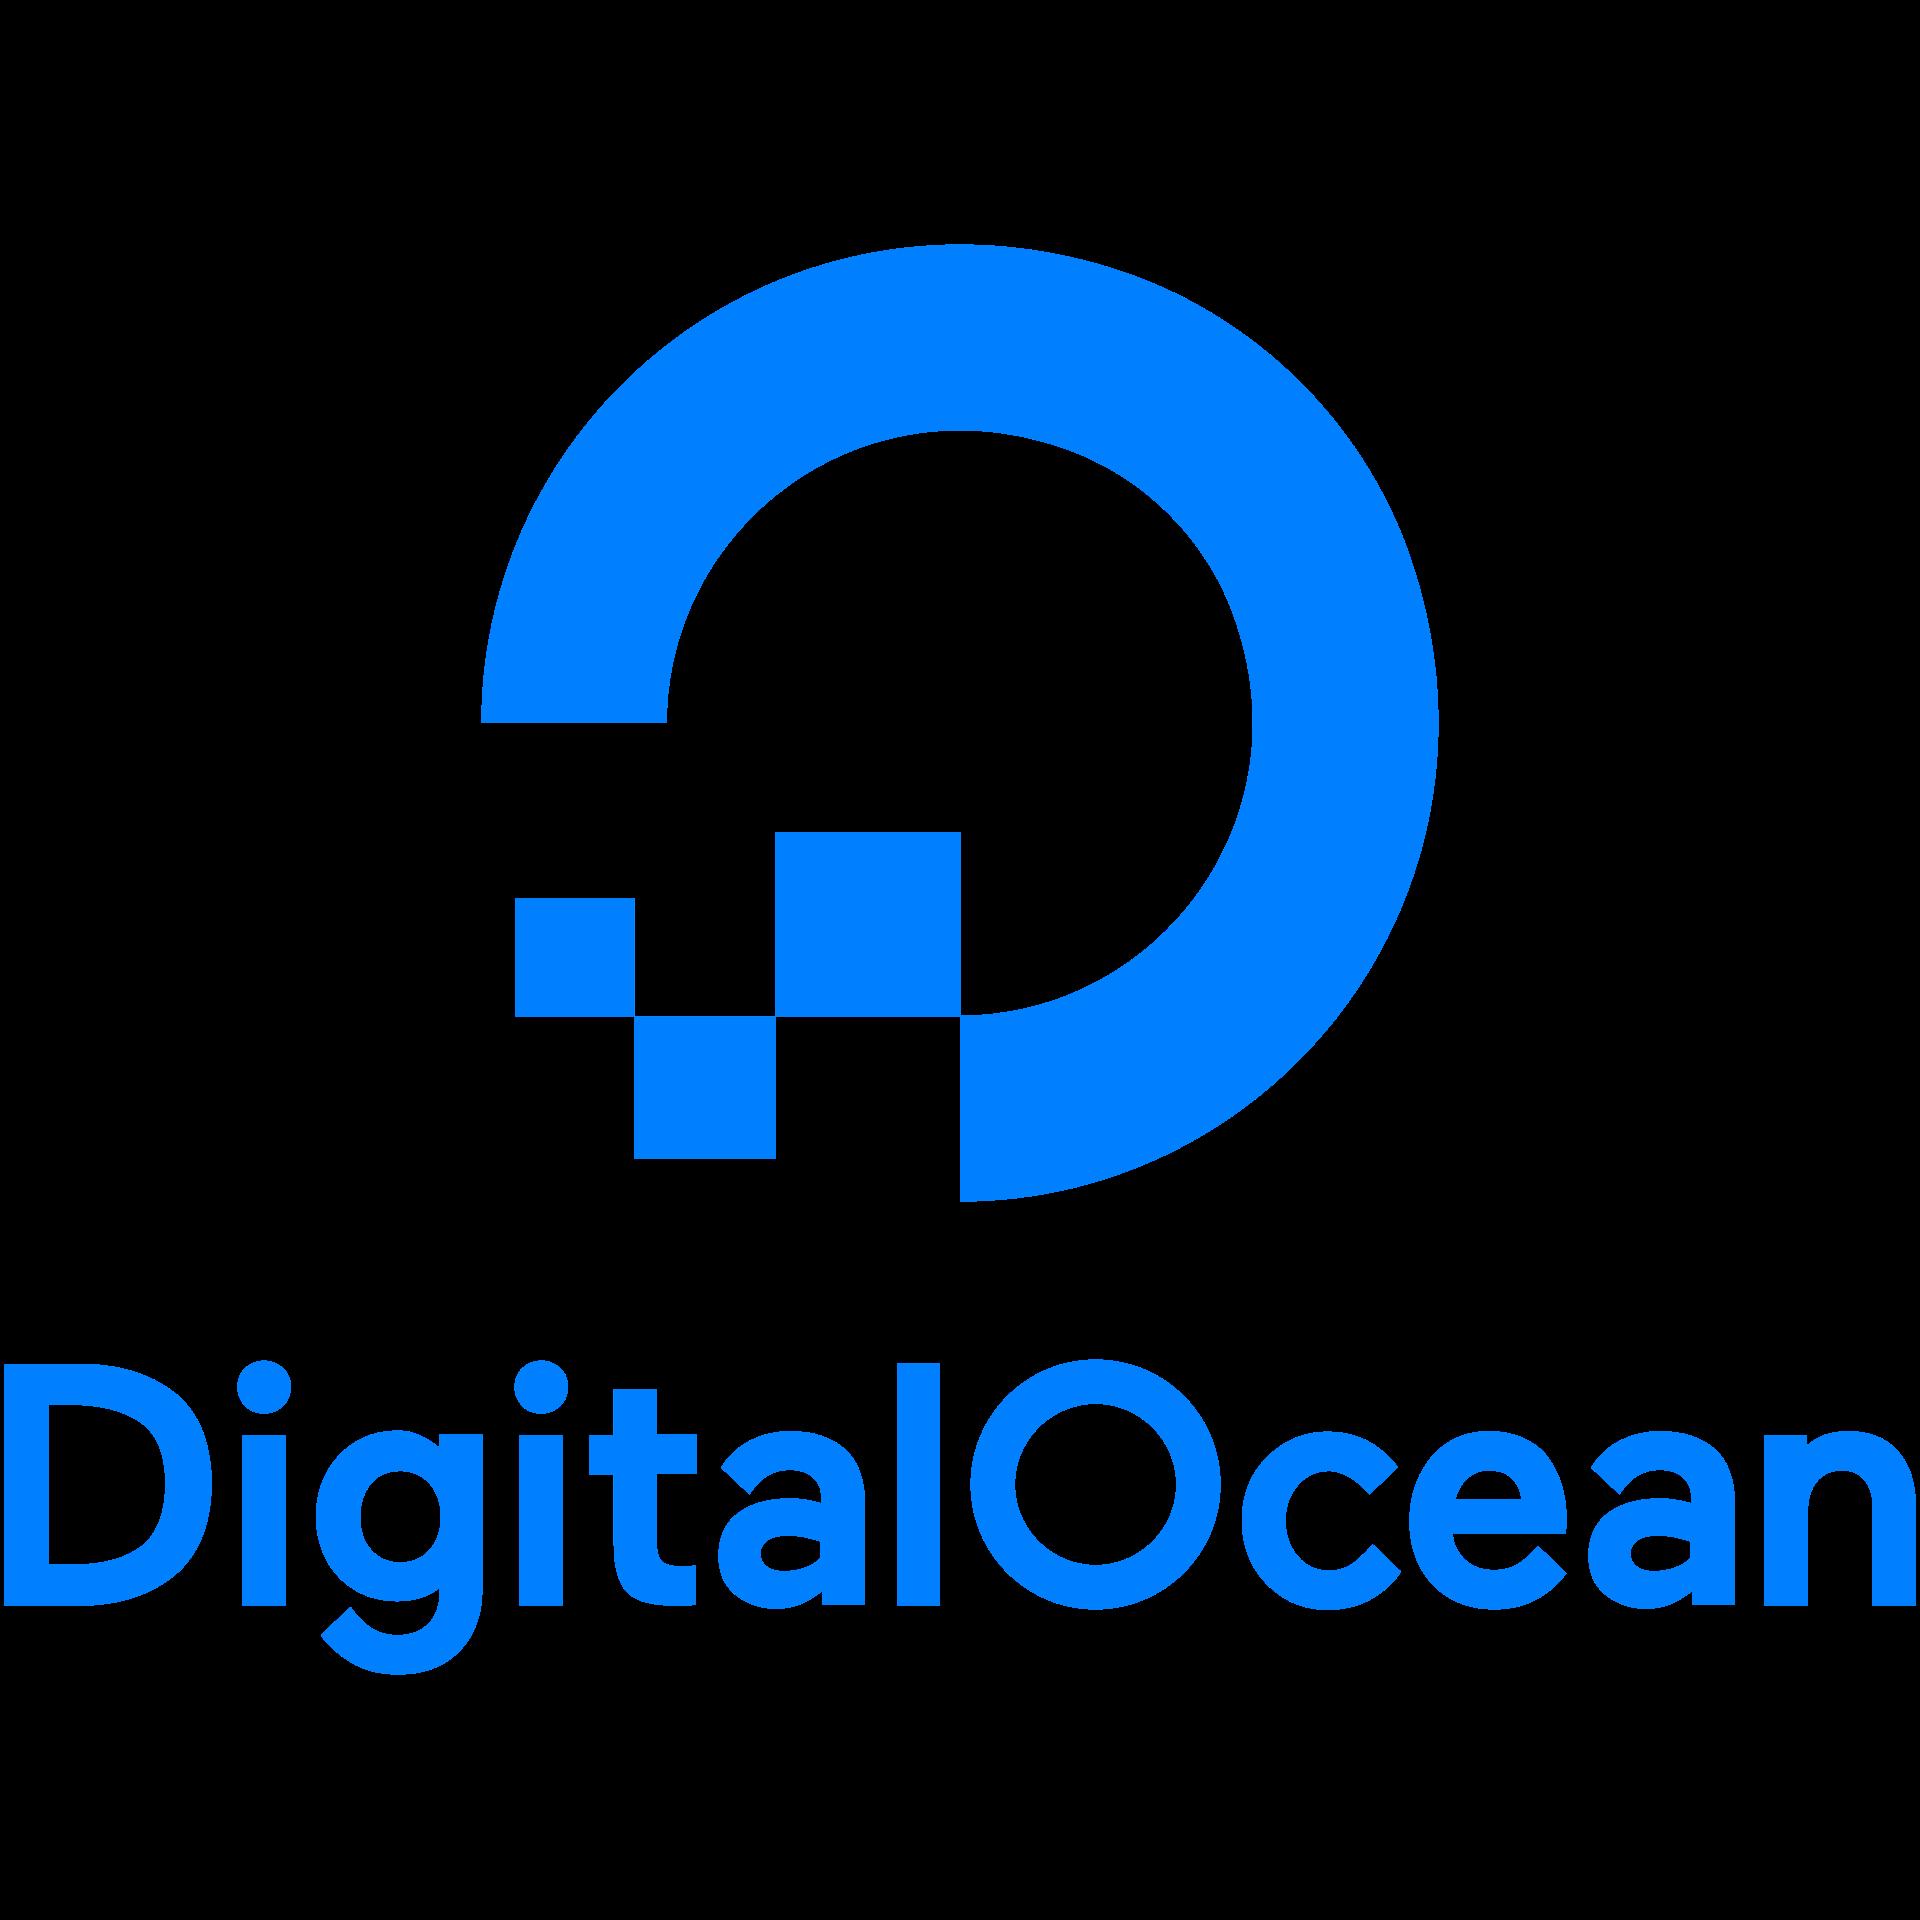 1920px-DigitalOcean_logo